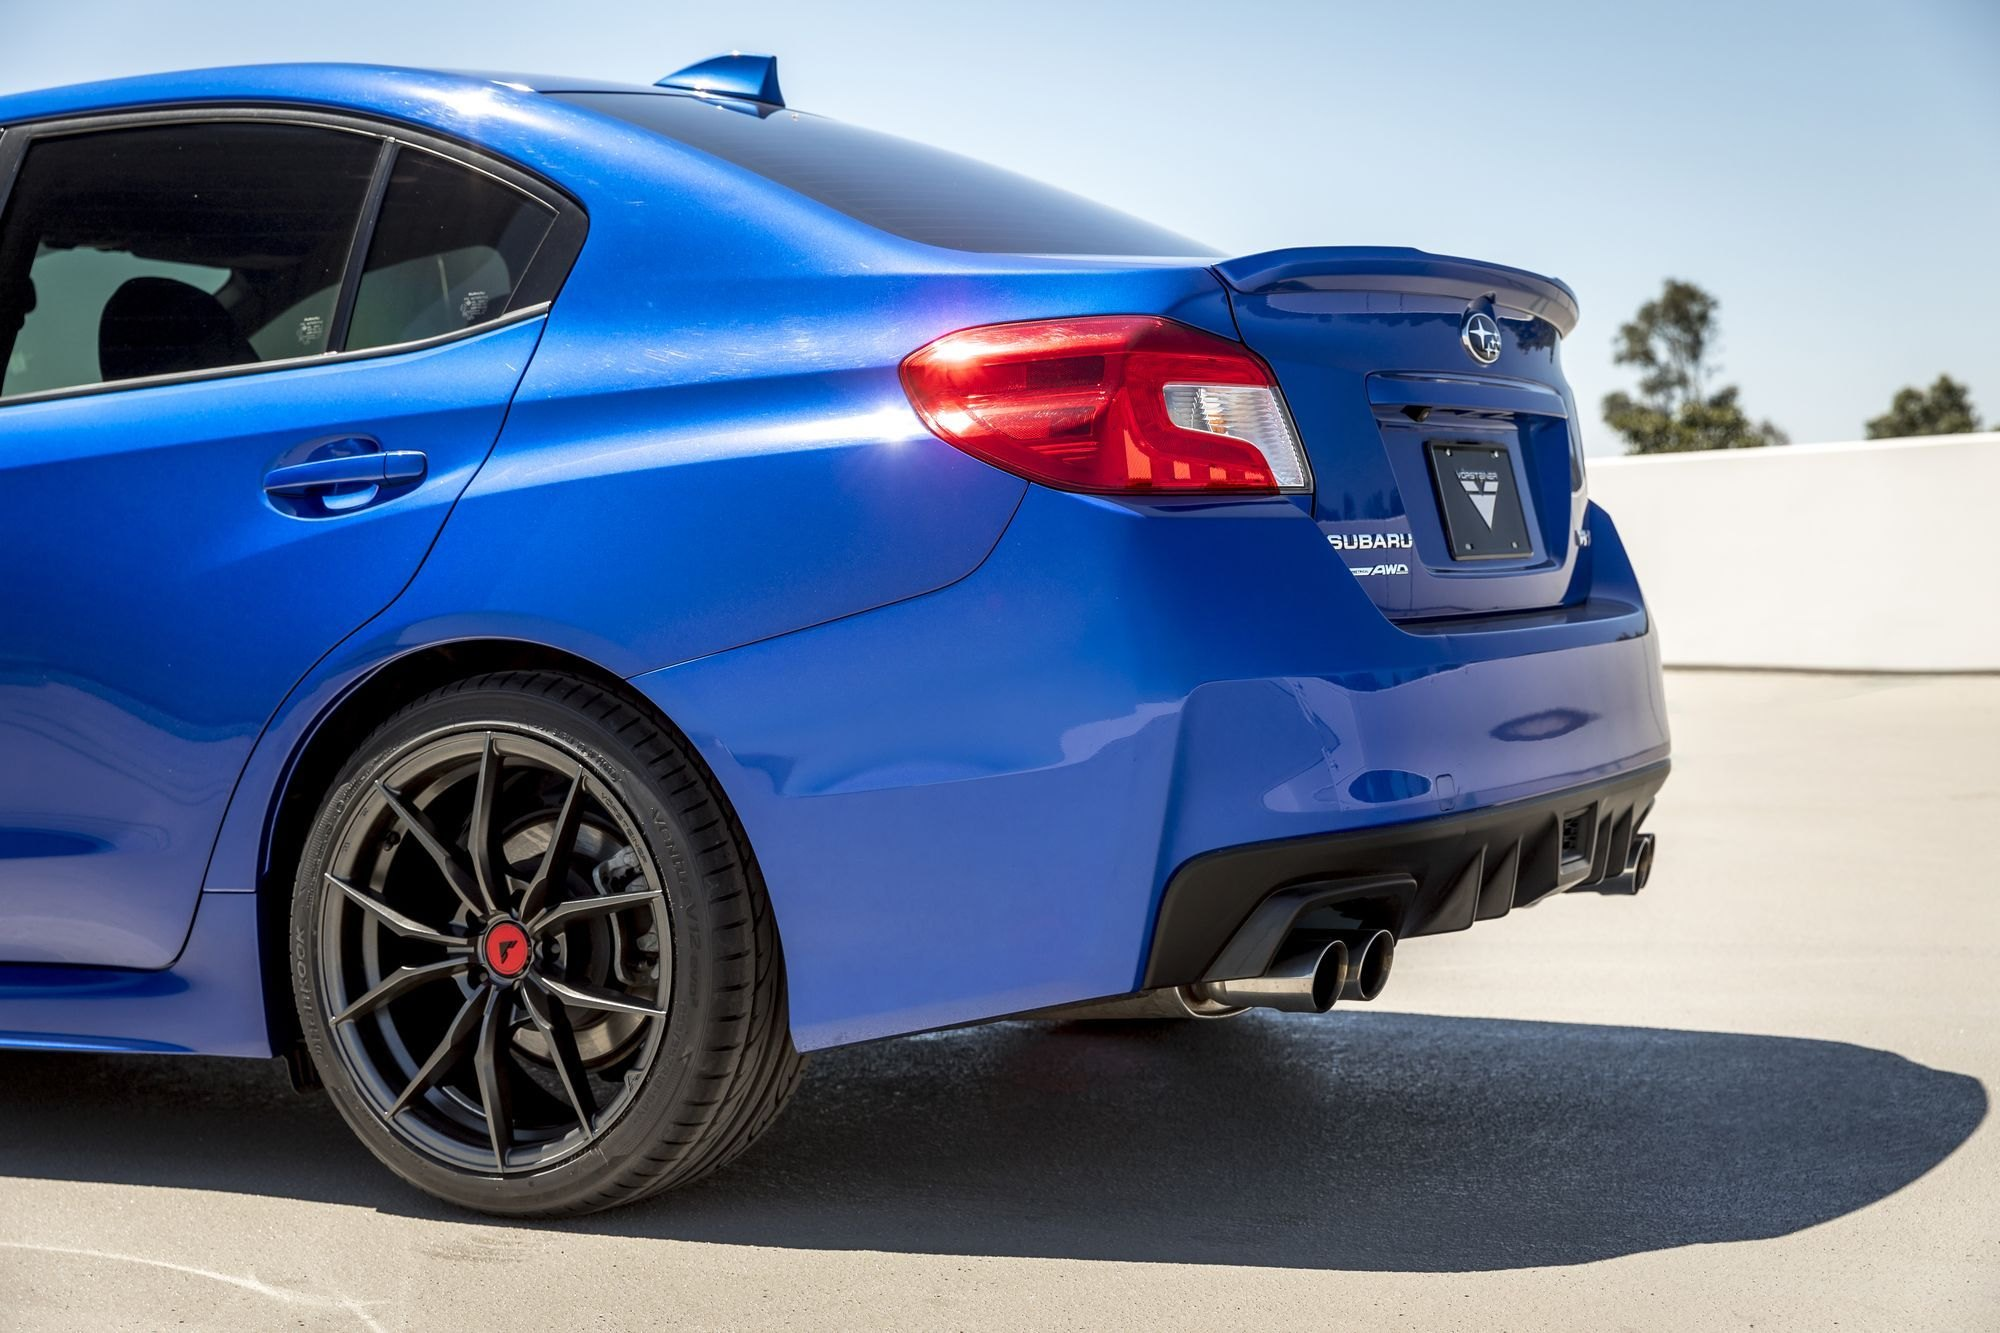 Rear Lip Spoiler On Blue Subaru Wrx Photo By Vorstiner